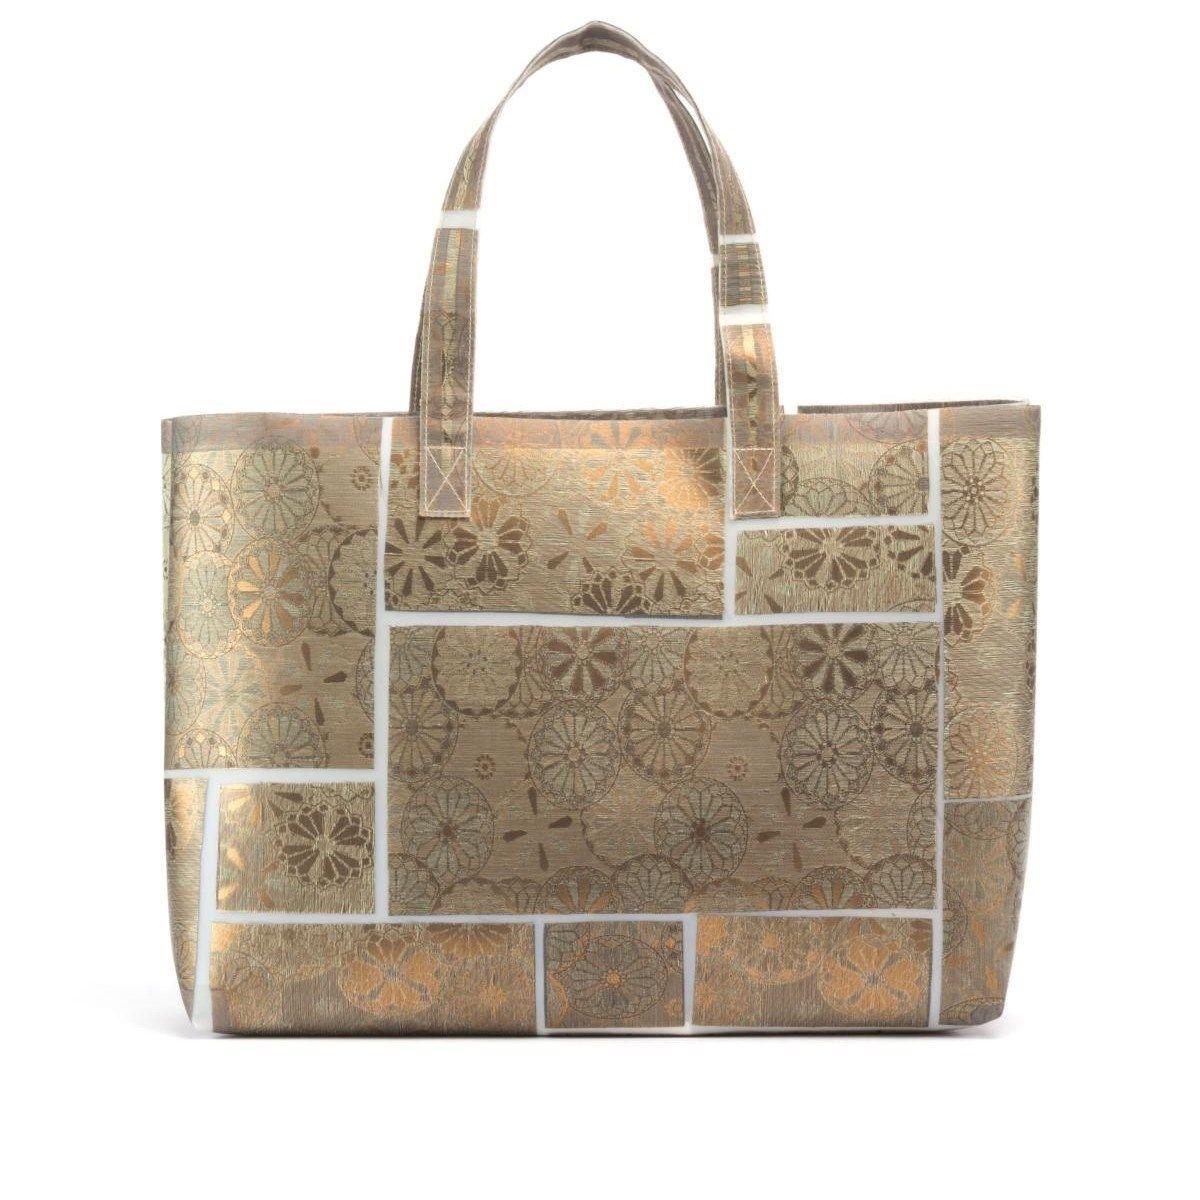 Grand sac Cabas tissus précieux Fil textile Giuseppe